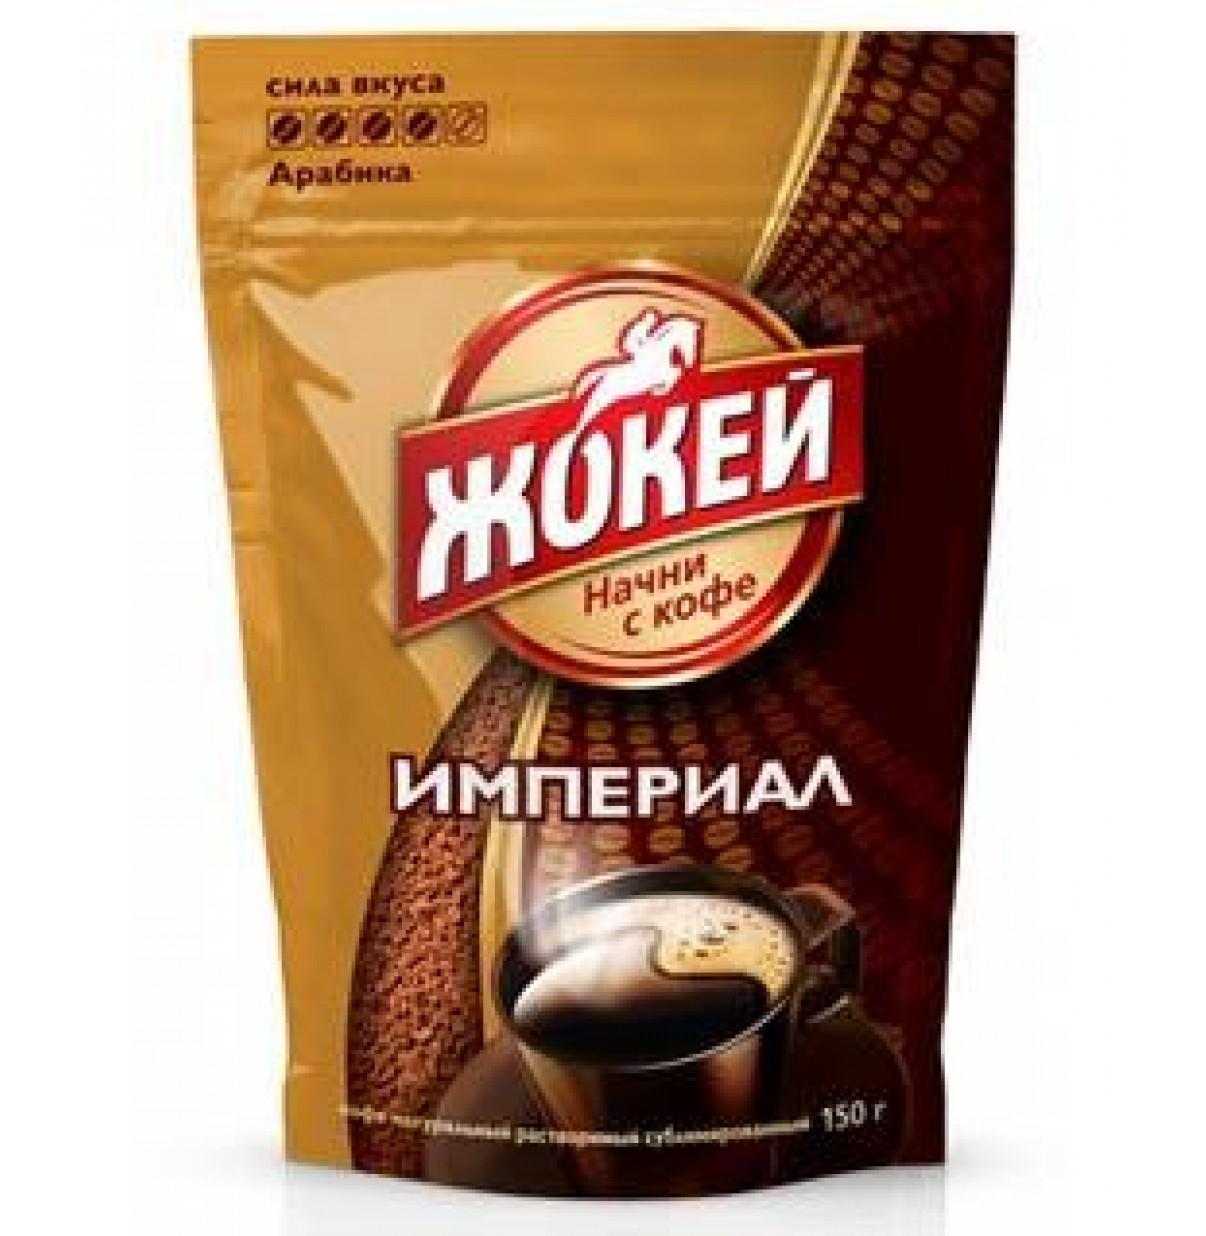 Кофе Жокей Империал субл. м/у 150 гр